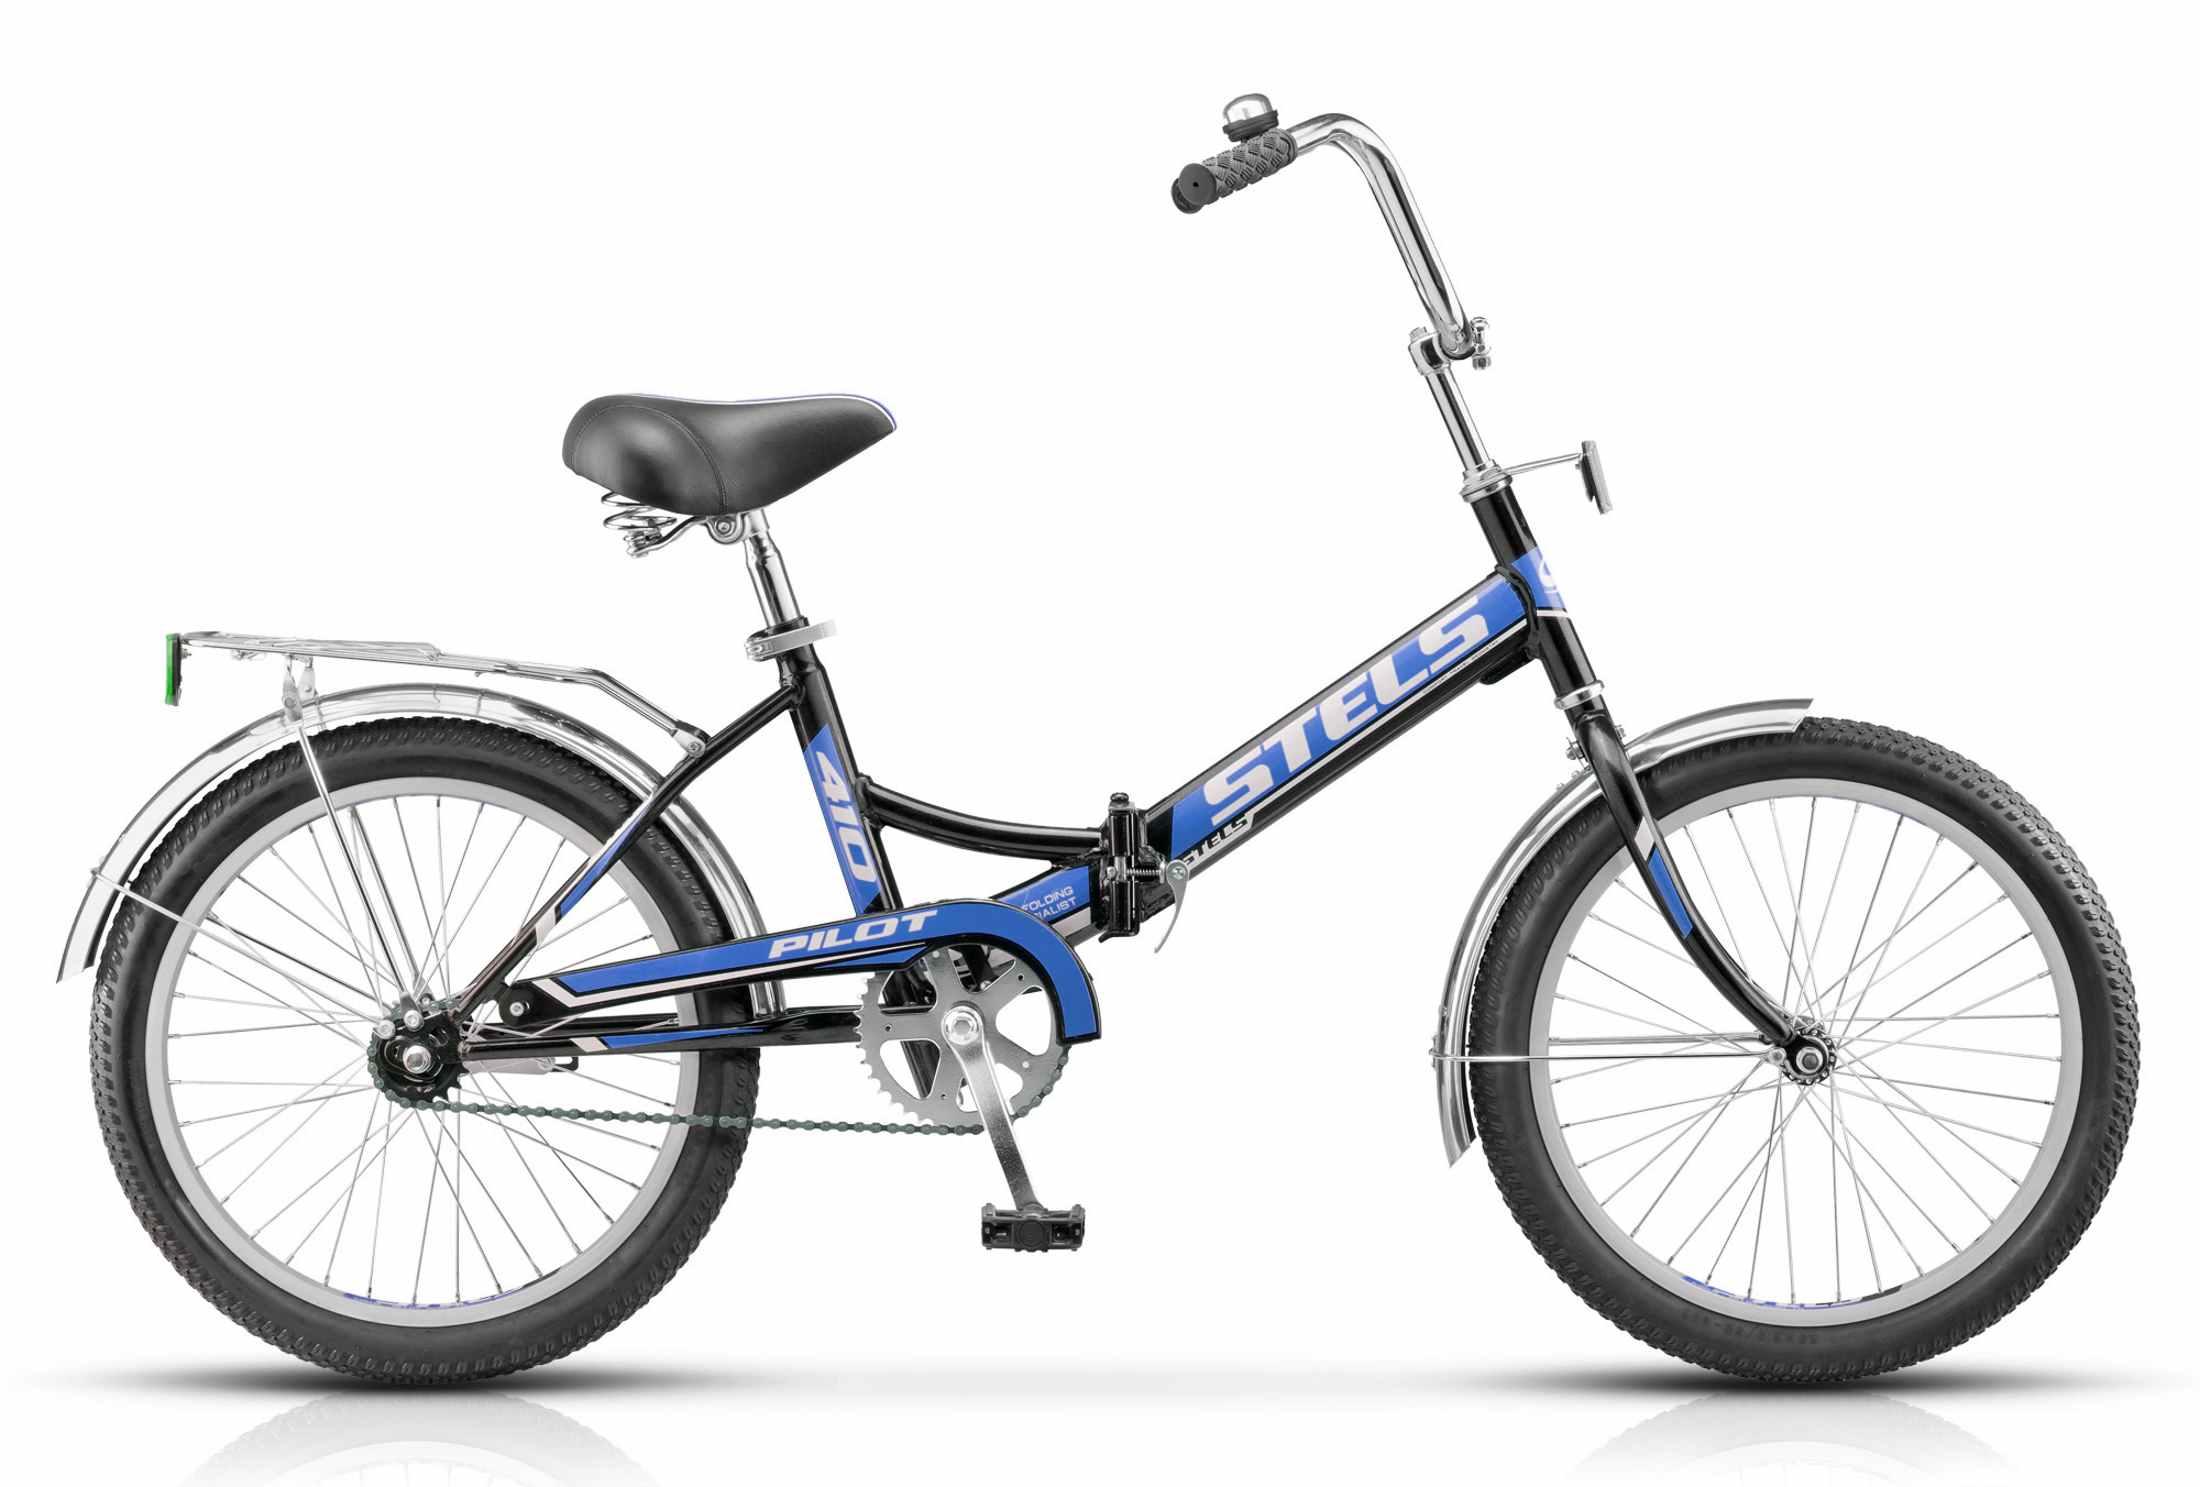 Велосипед Стелс Пилот 410 синий фото